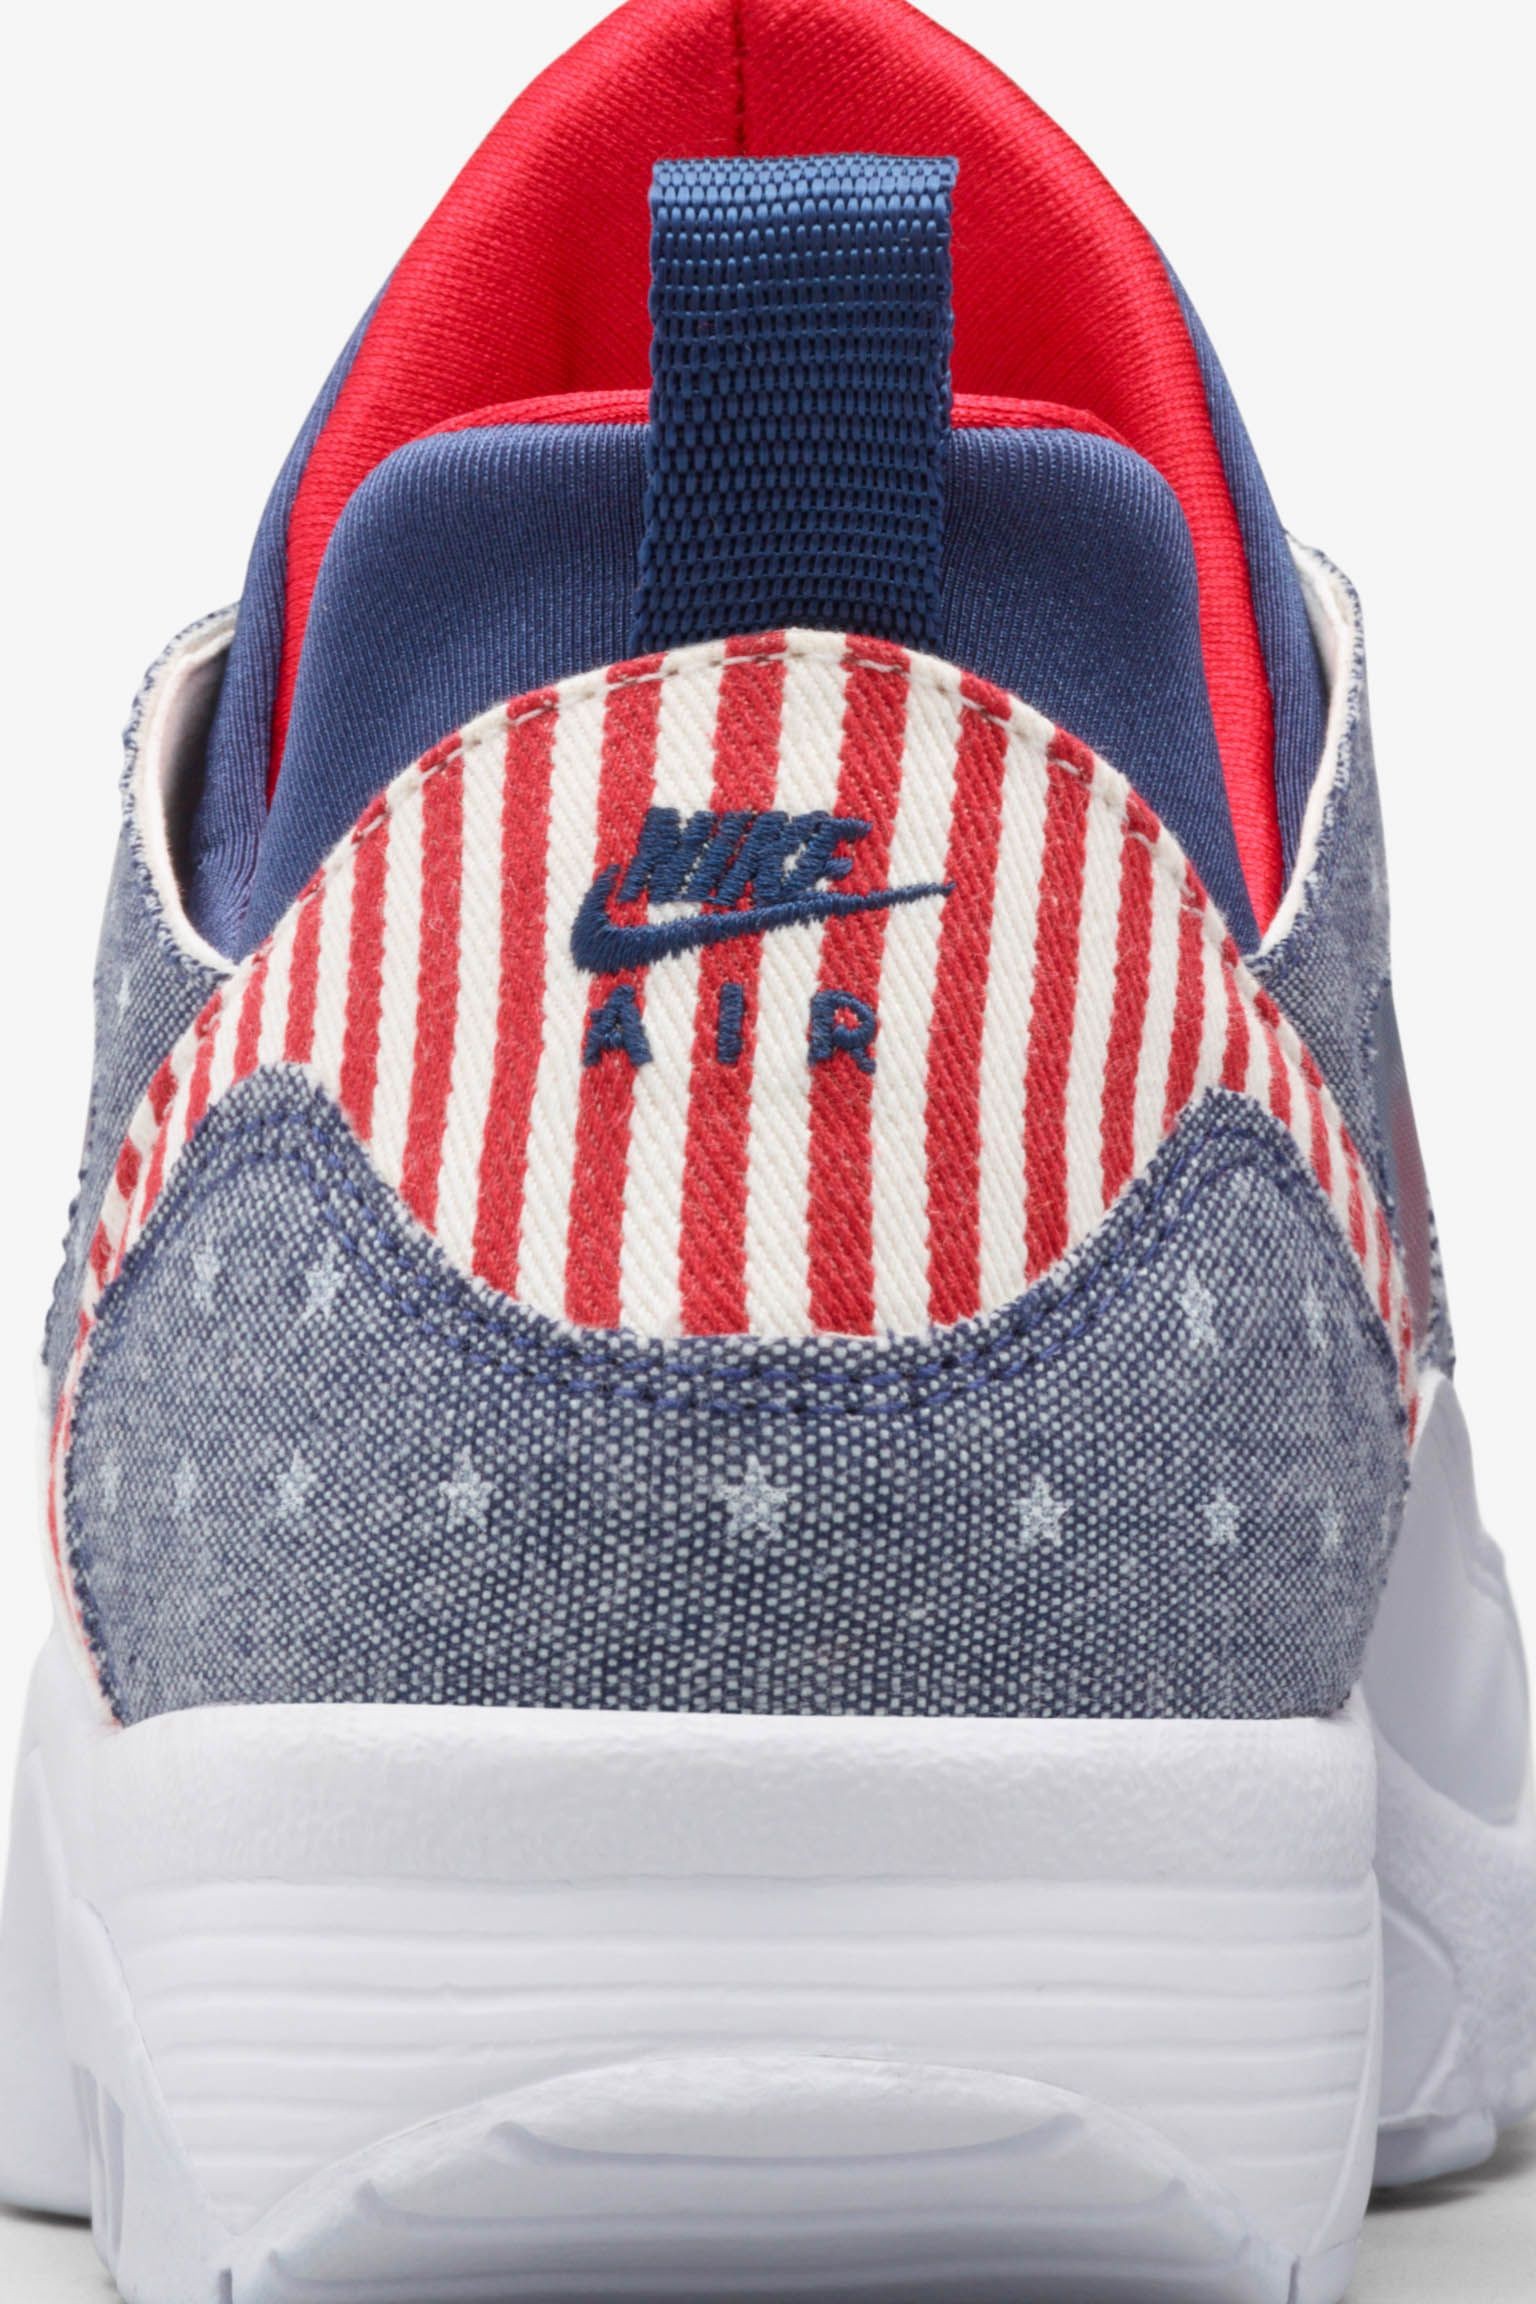 Nike Air Trainer Huarache Low 'USA'